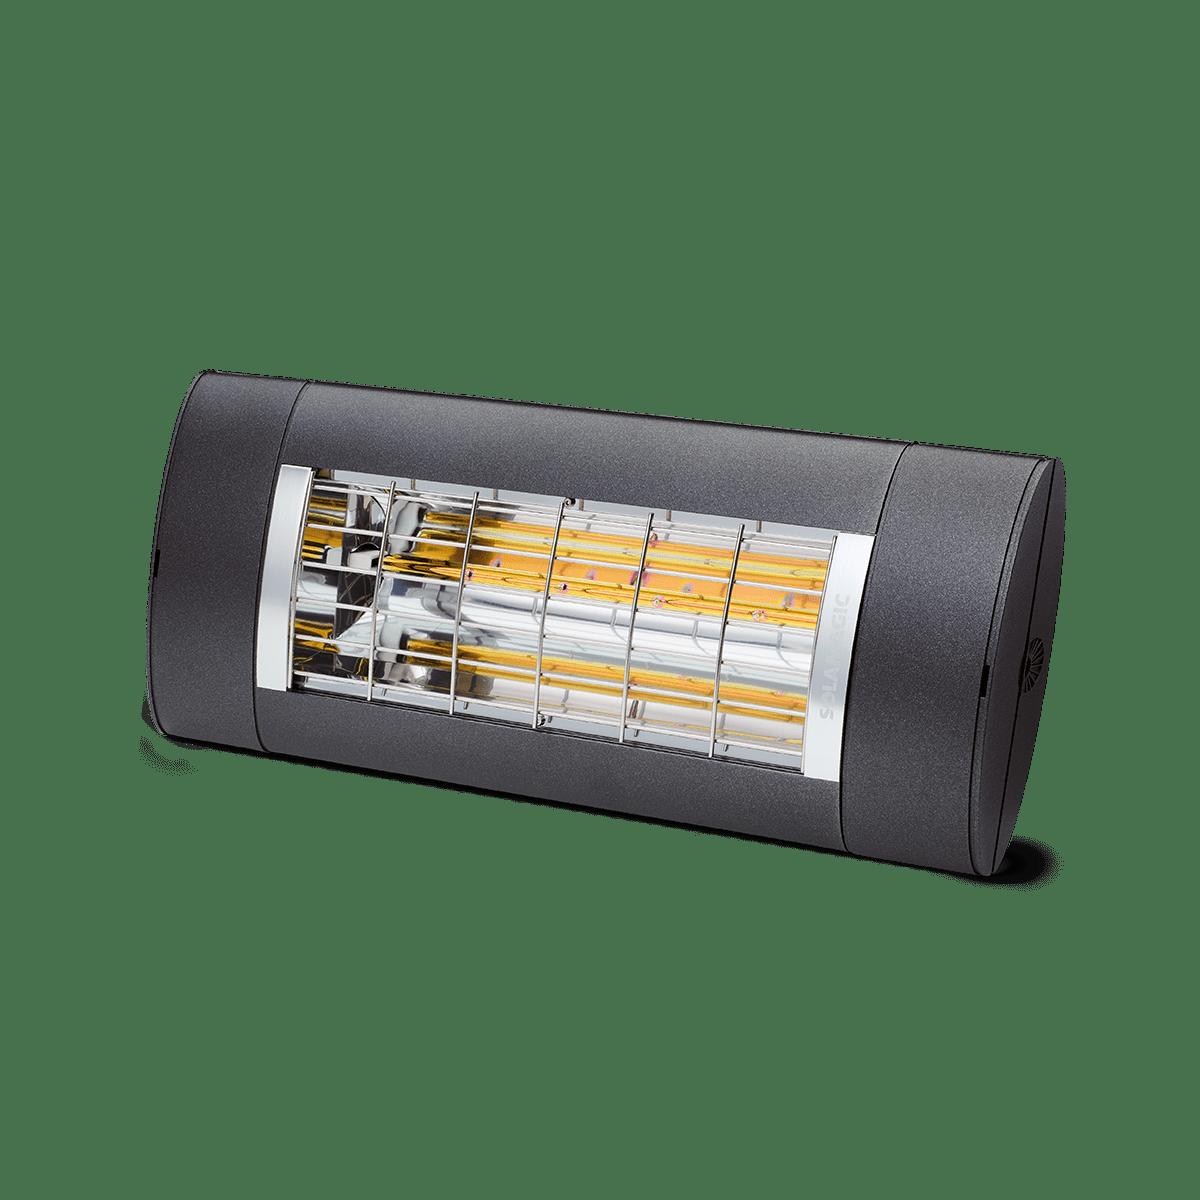 Solamagic teressevarmer PREMIUM_1400_Anthracite_low